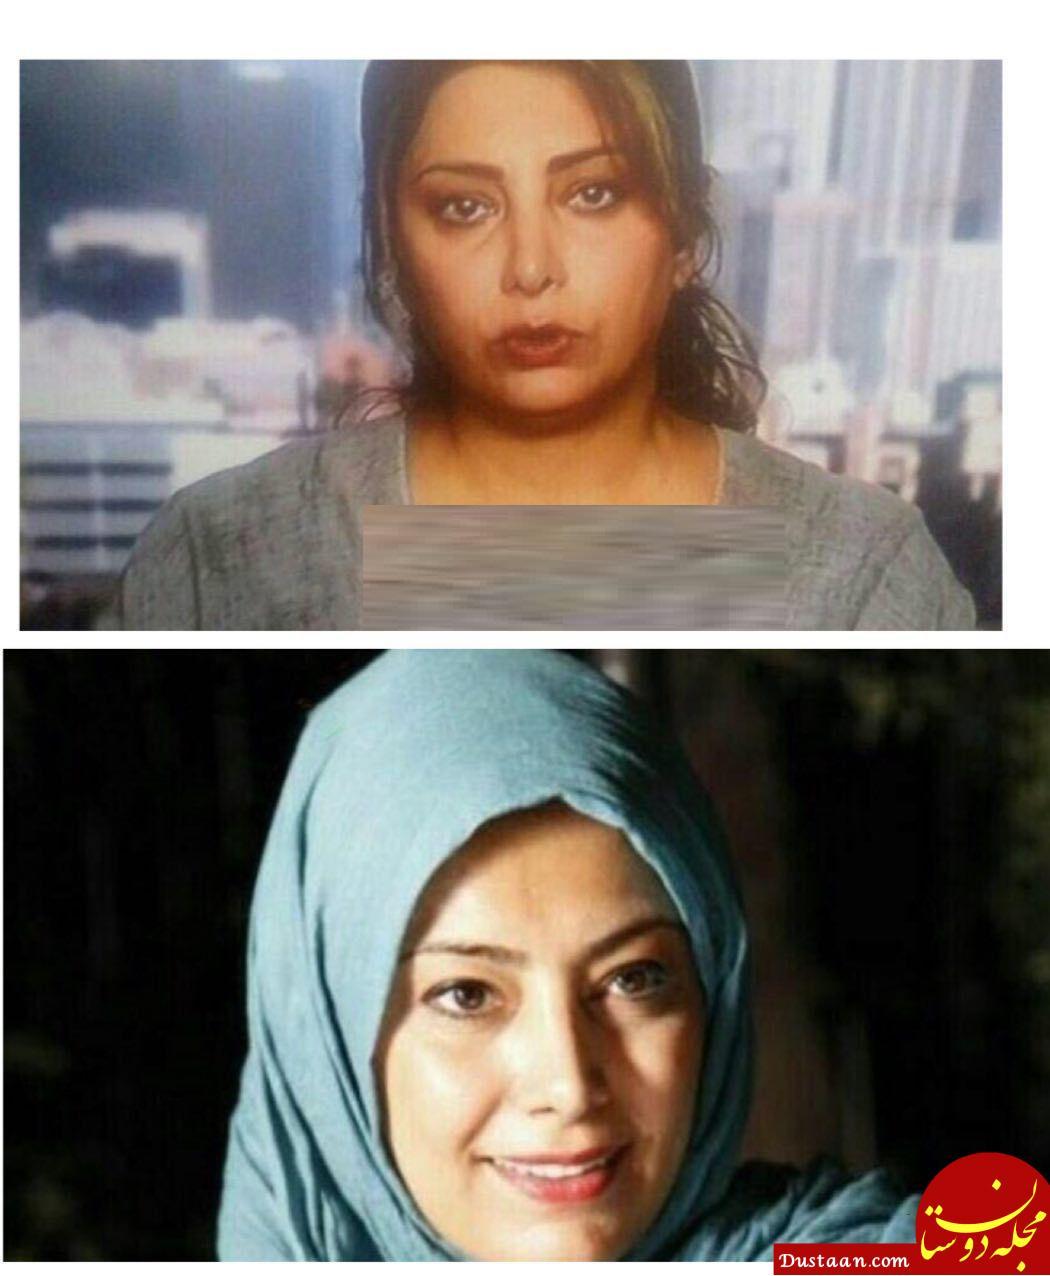 www.dustaan.com کشف حجاب لادن طباطبایی در خارج از کشور +عکس